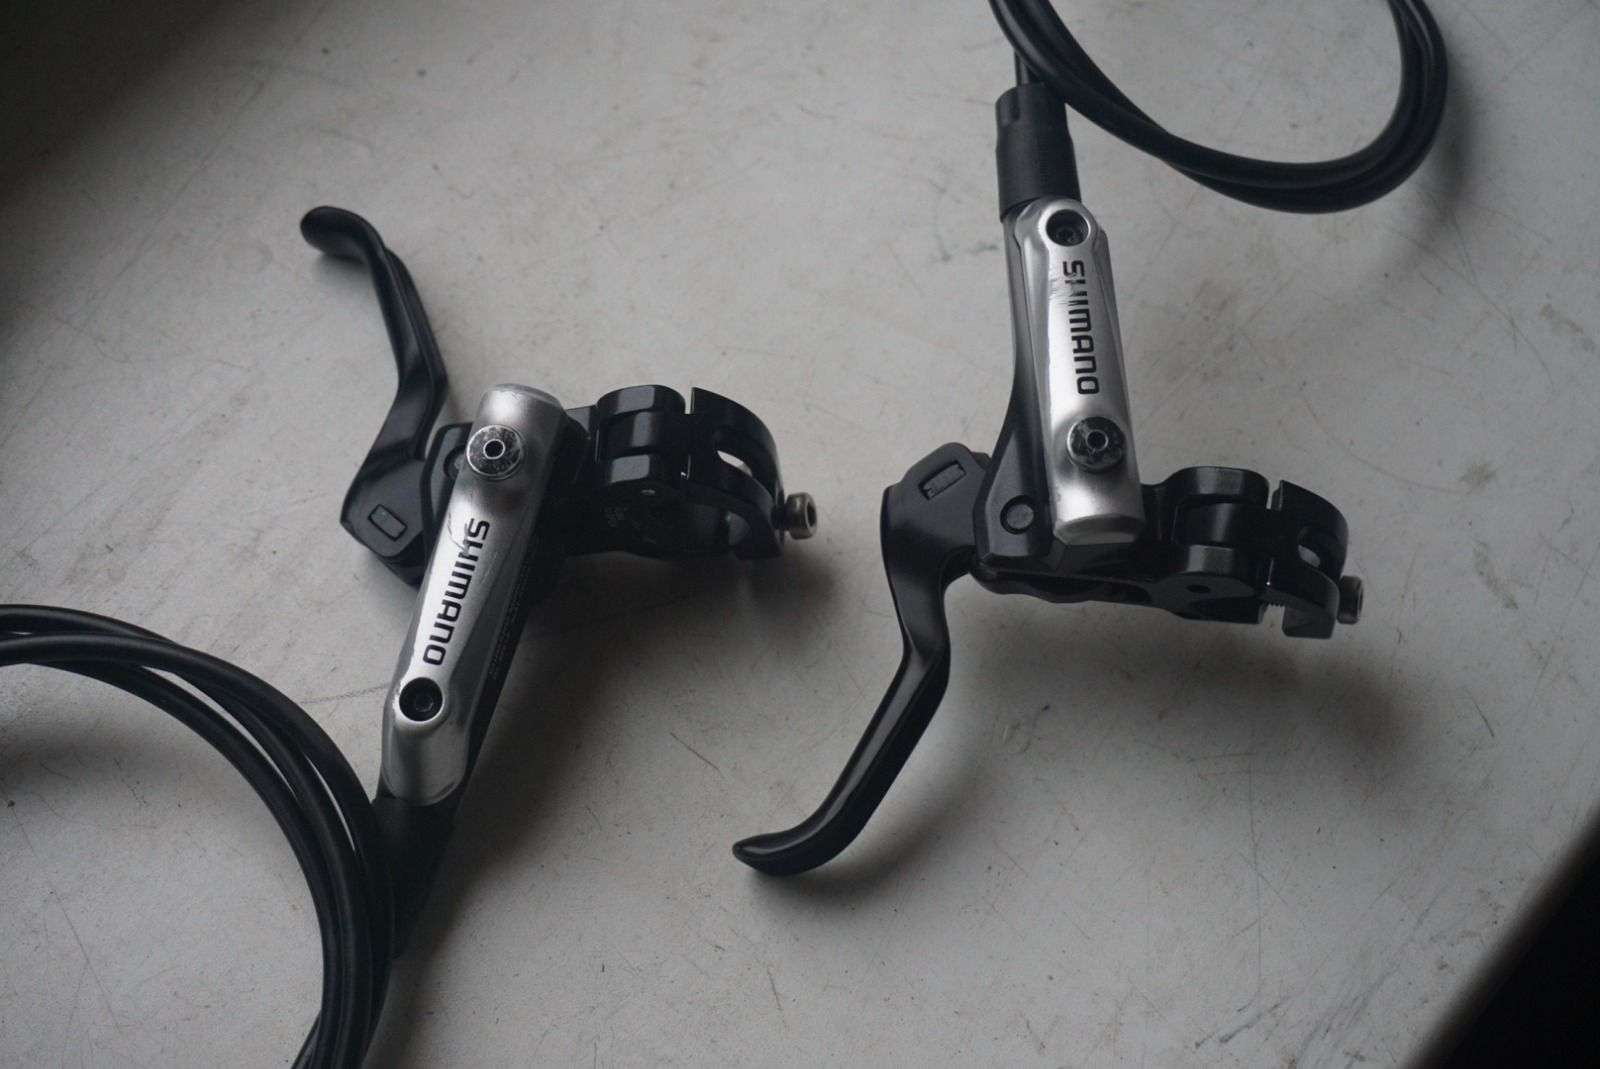 Тормоза Shimano Deore M615